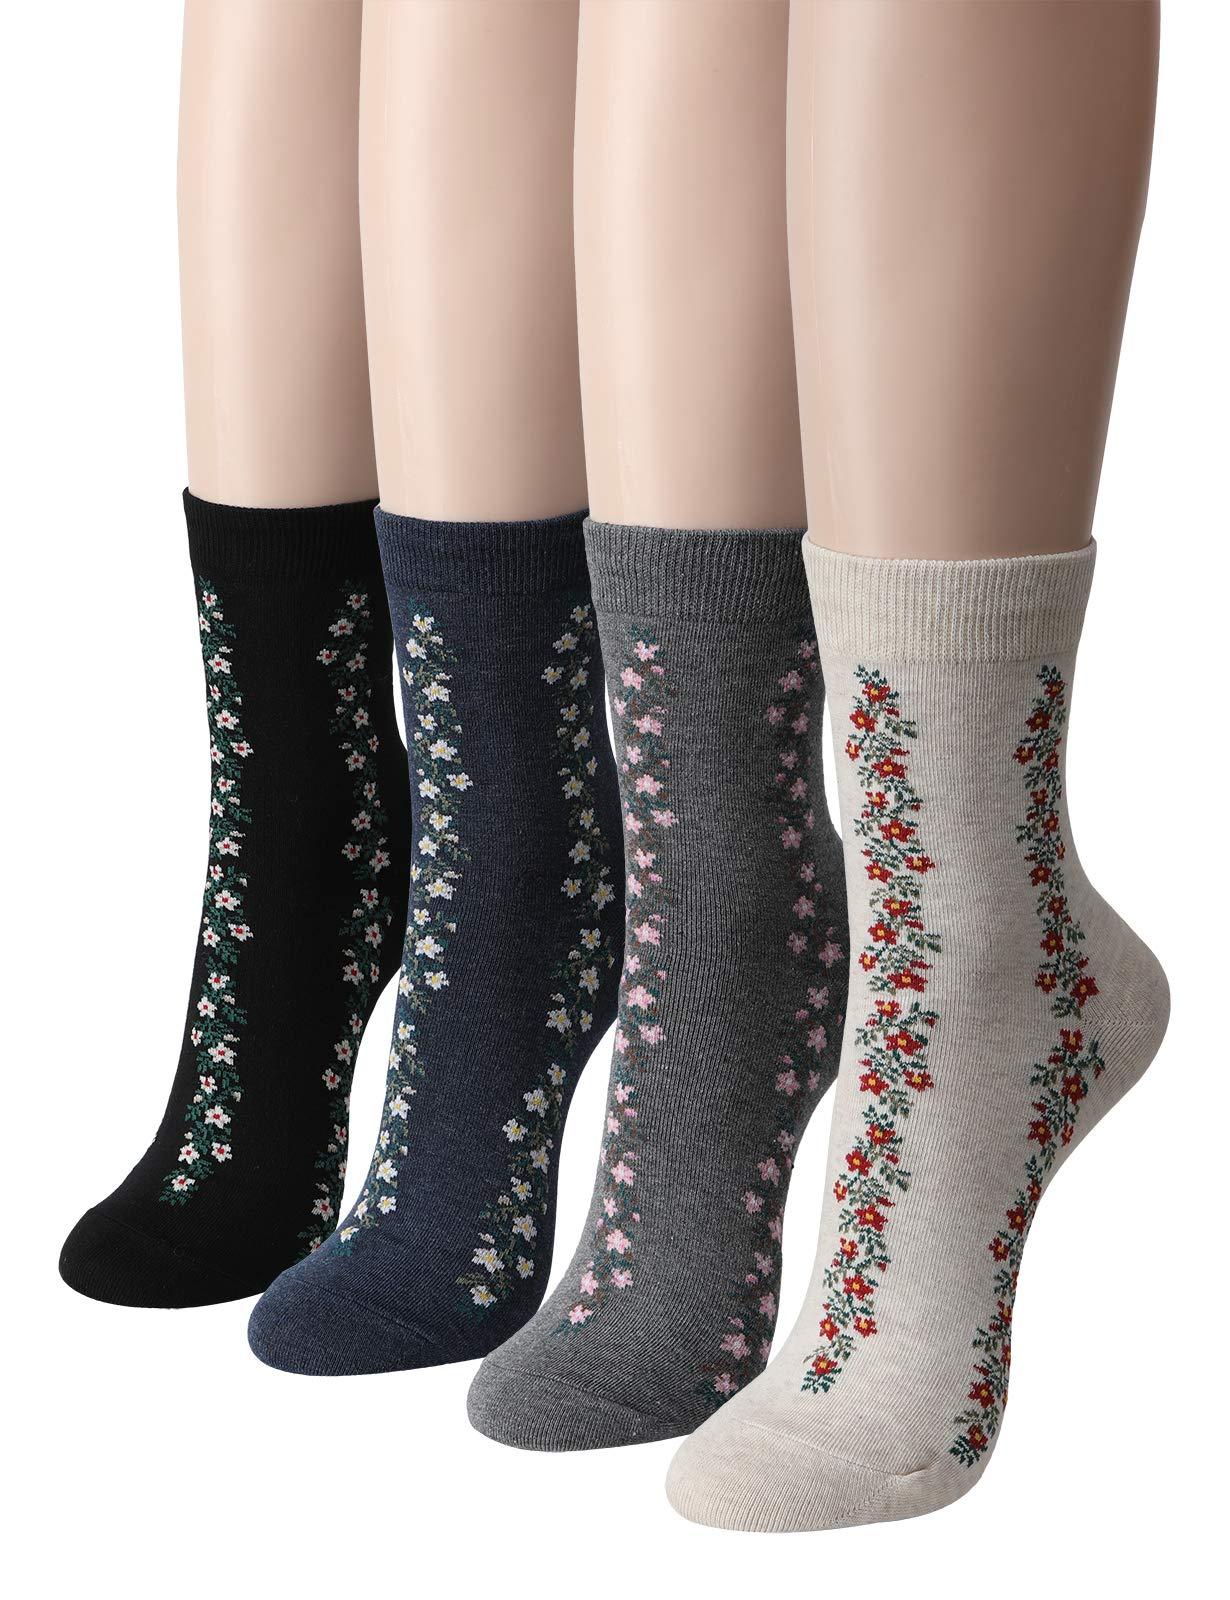 OSABASA Cotton Blend Women's Dress Socks -3 to 5 Pairs of Various Styles